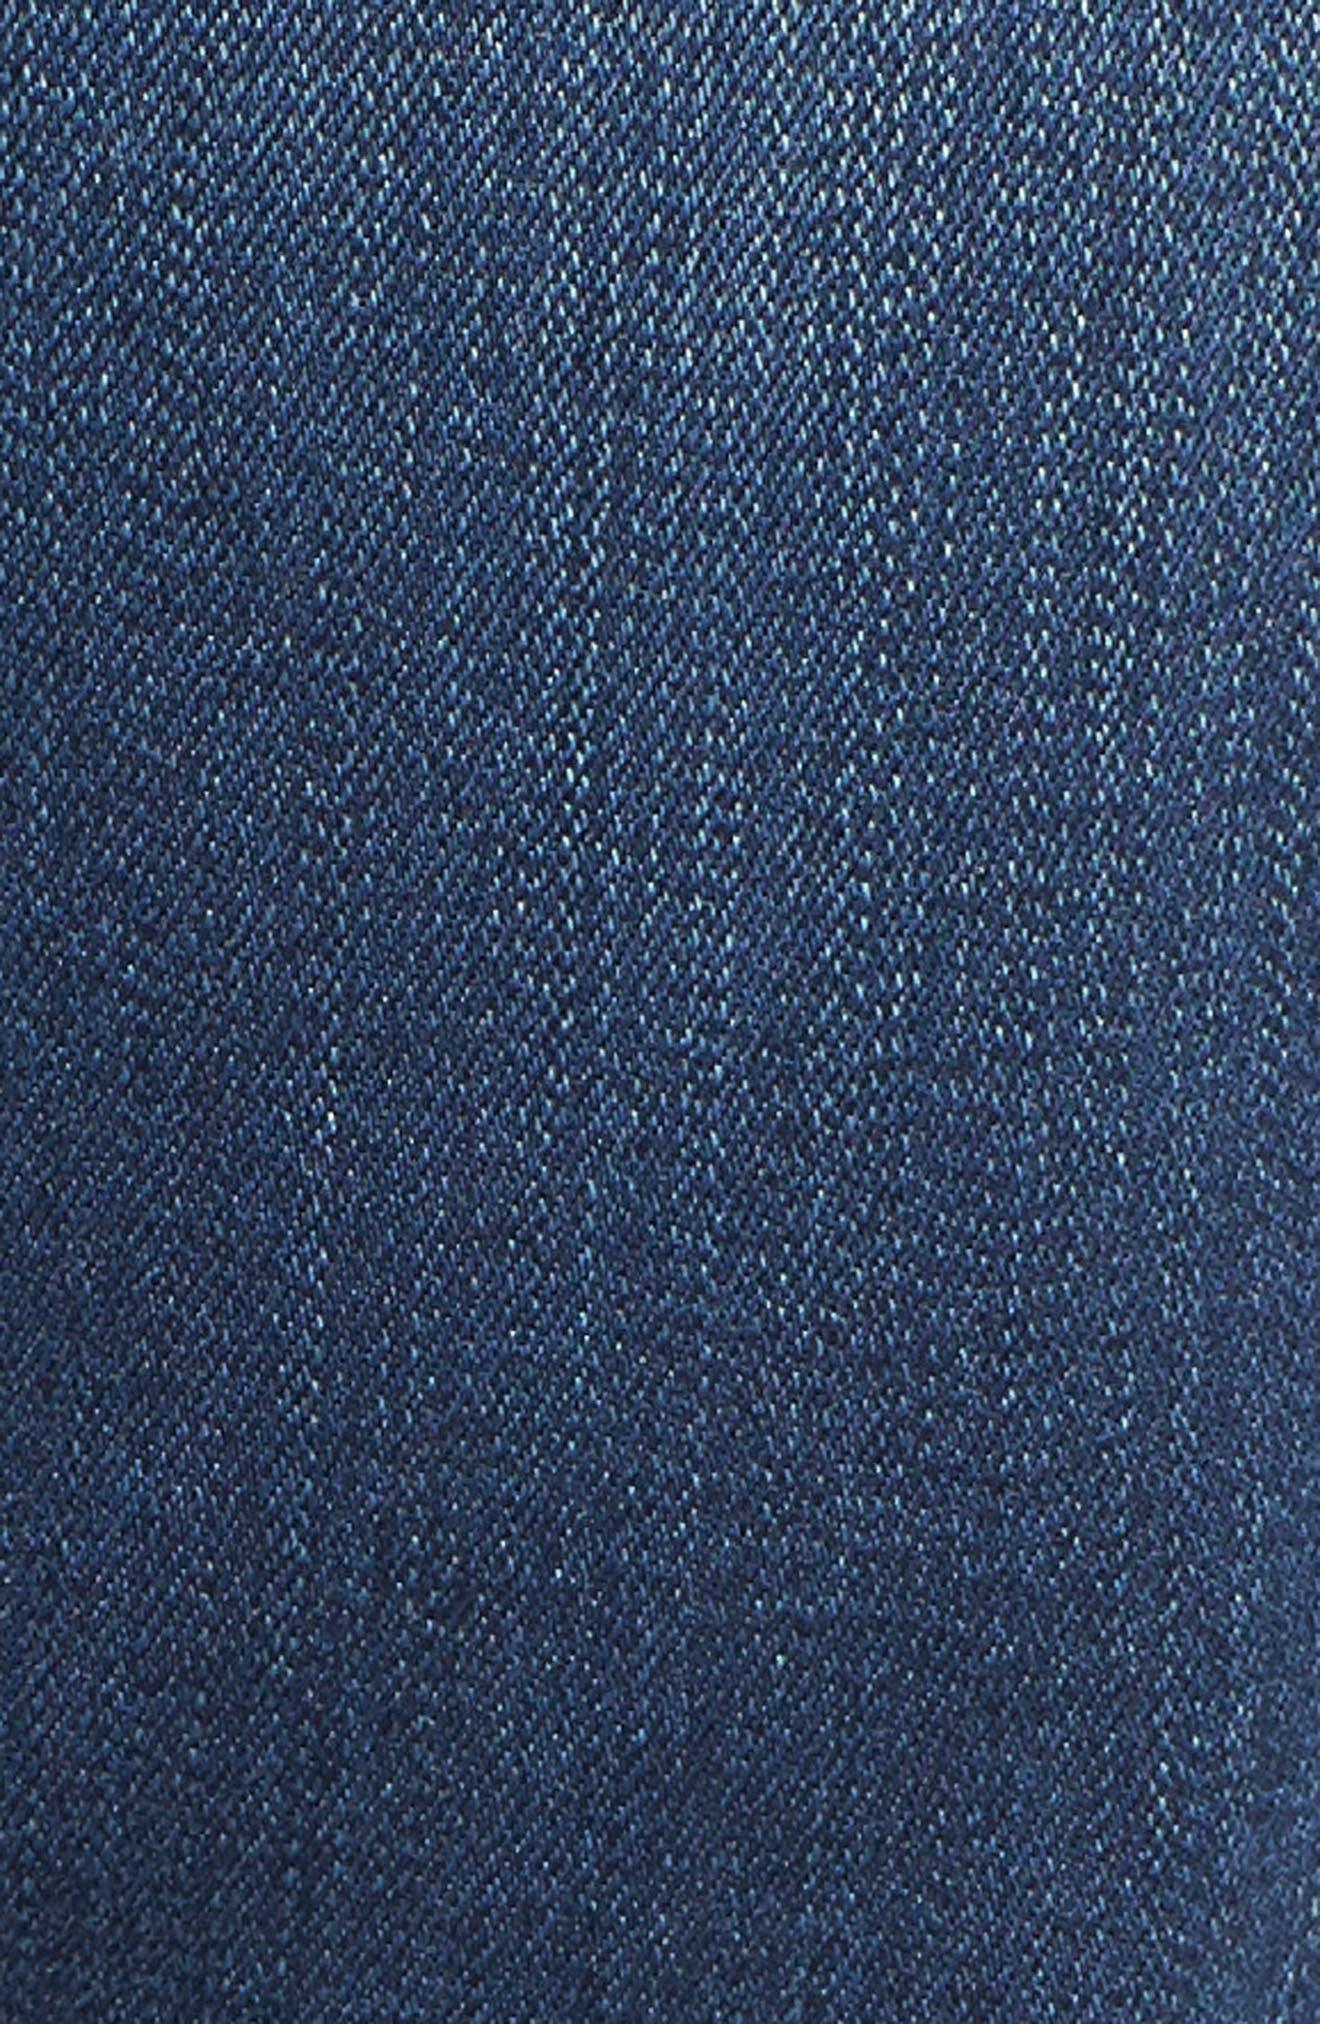 Hudson Blake Slim Fit Jeans,                             Alternate thumbnail 5, color,                             421